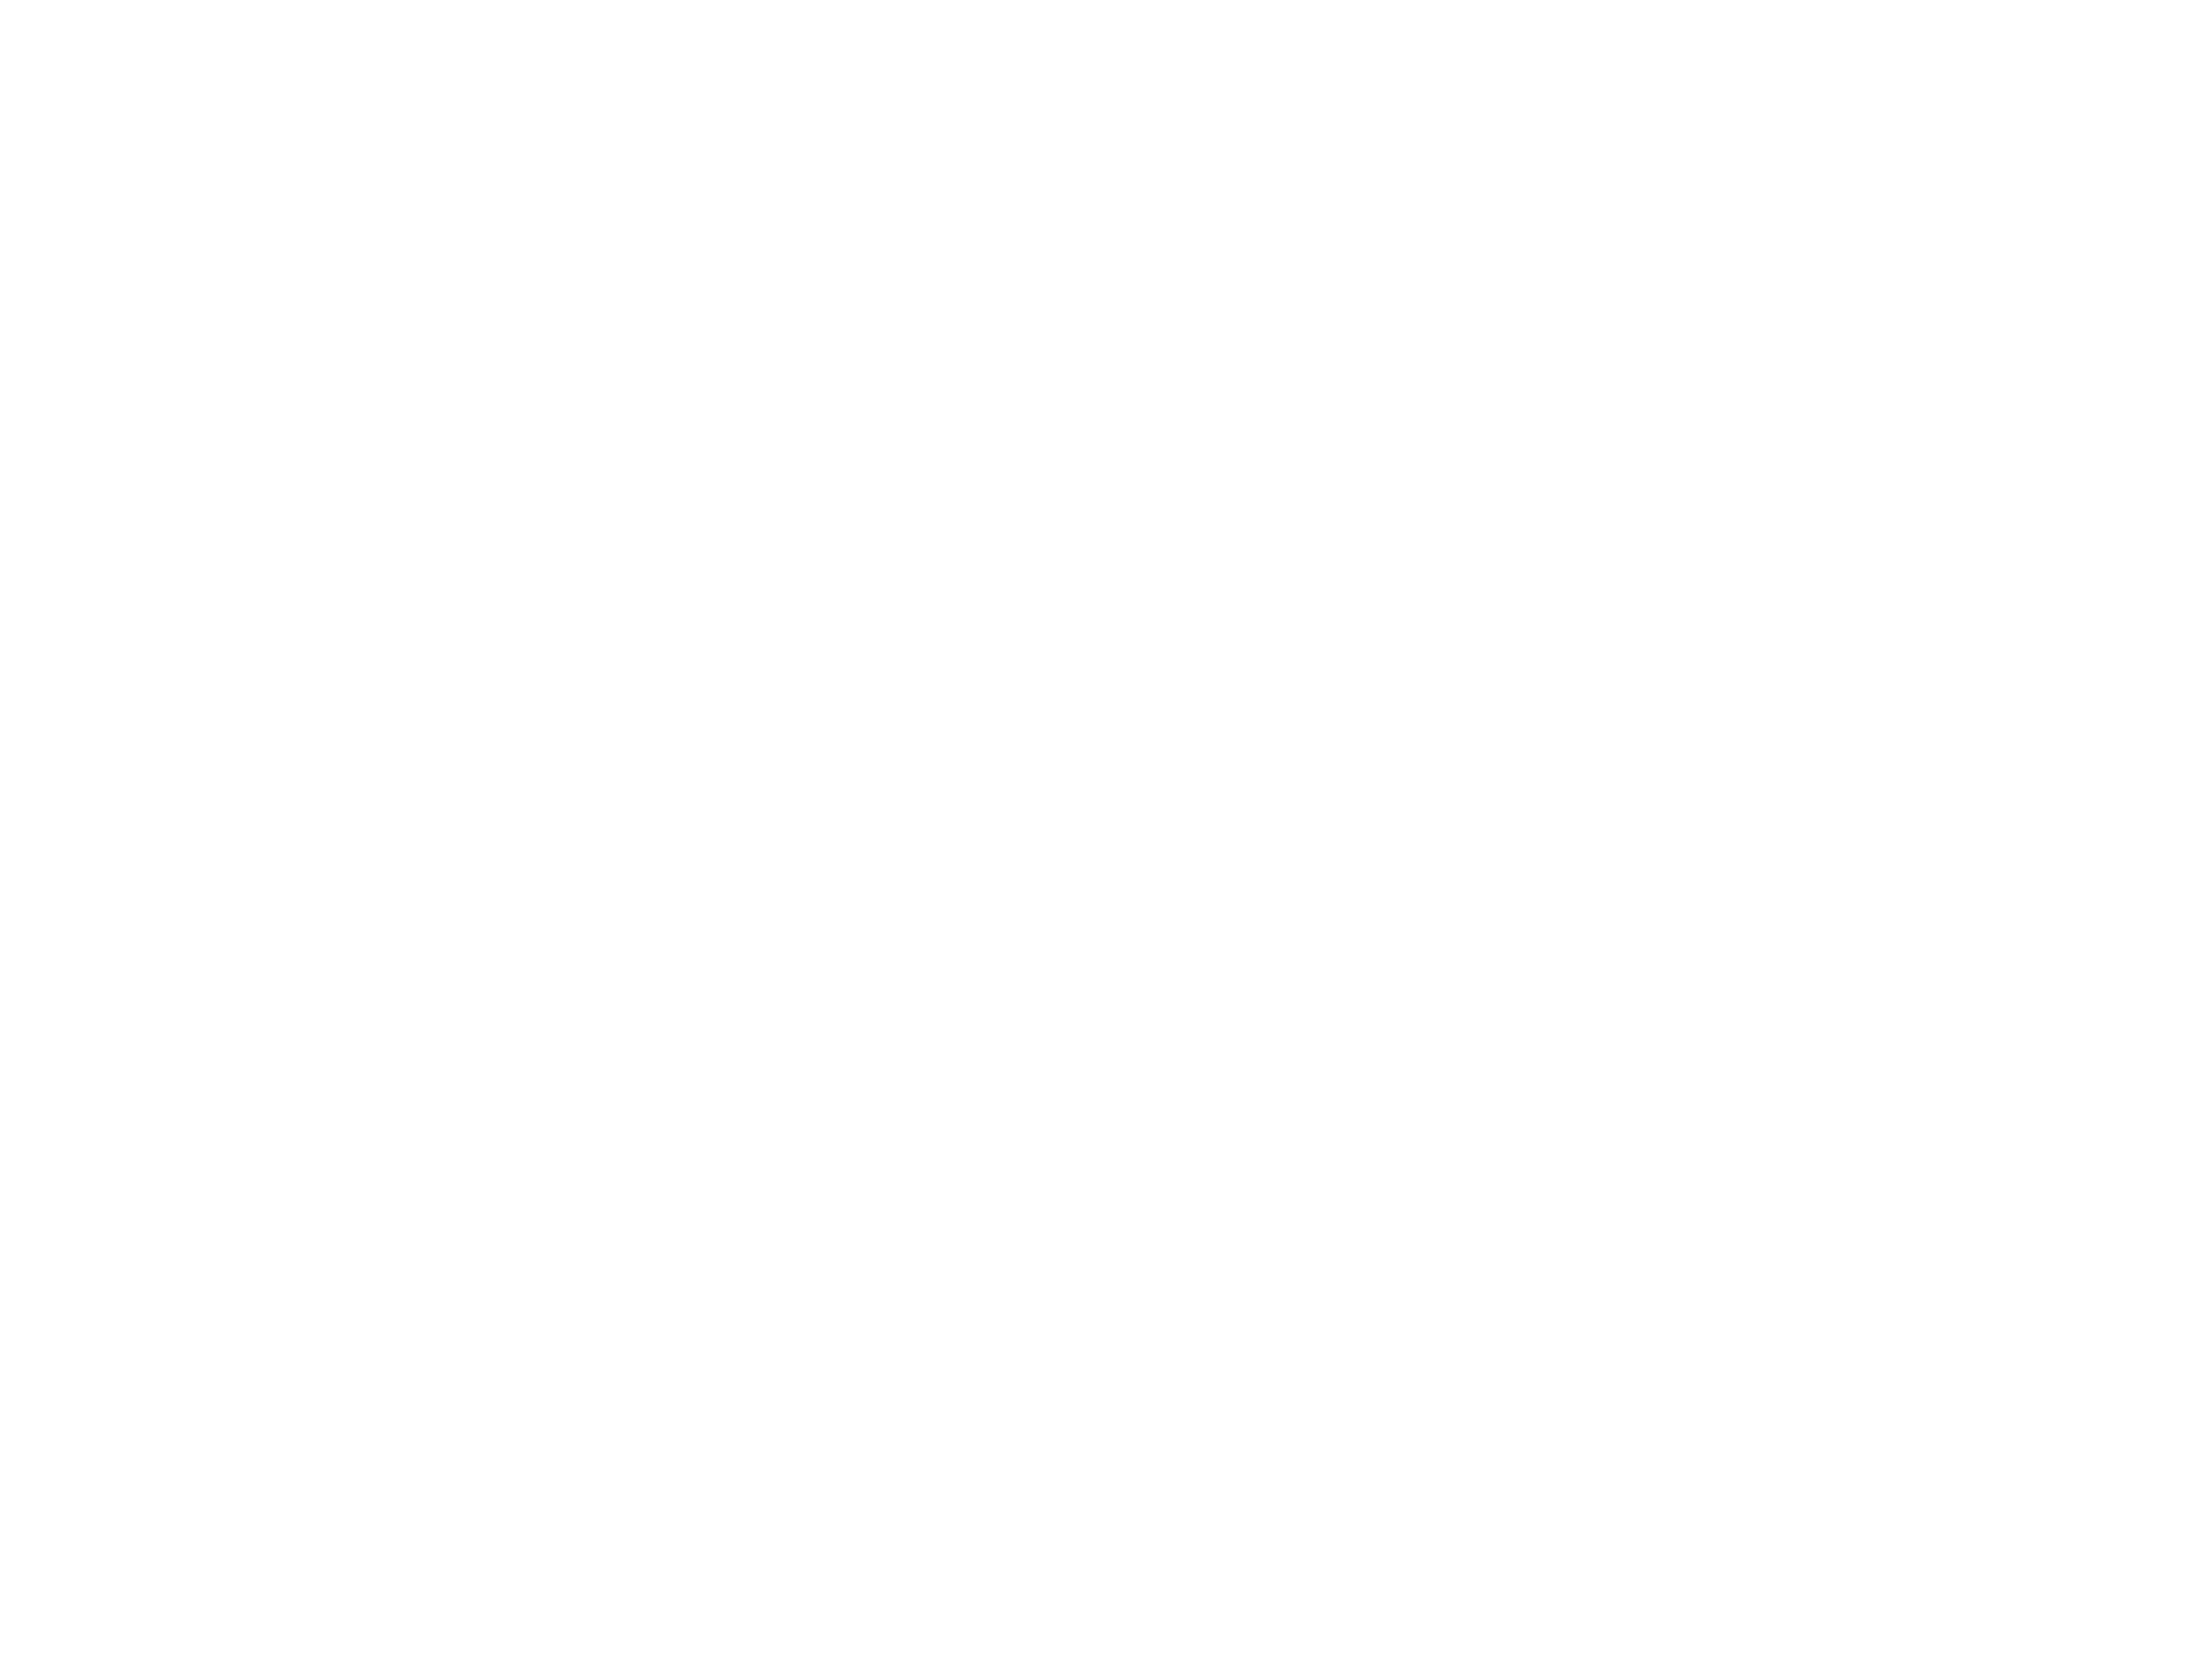 James Maness